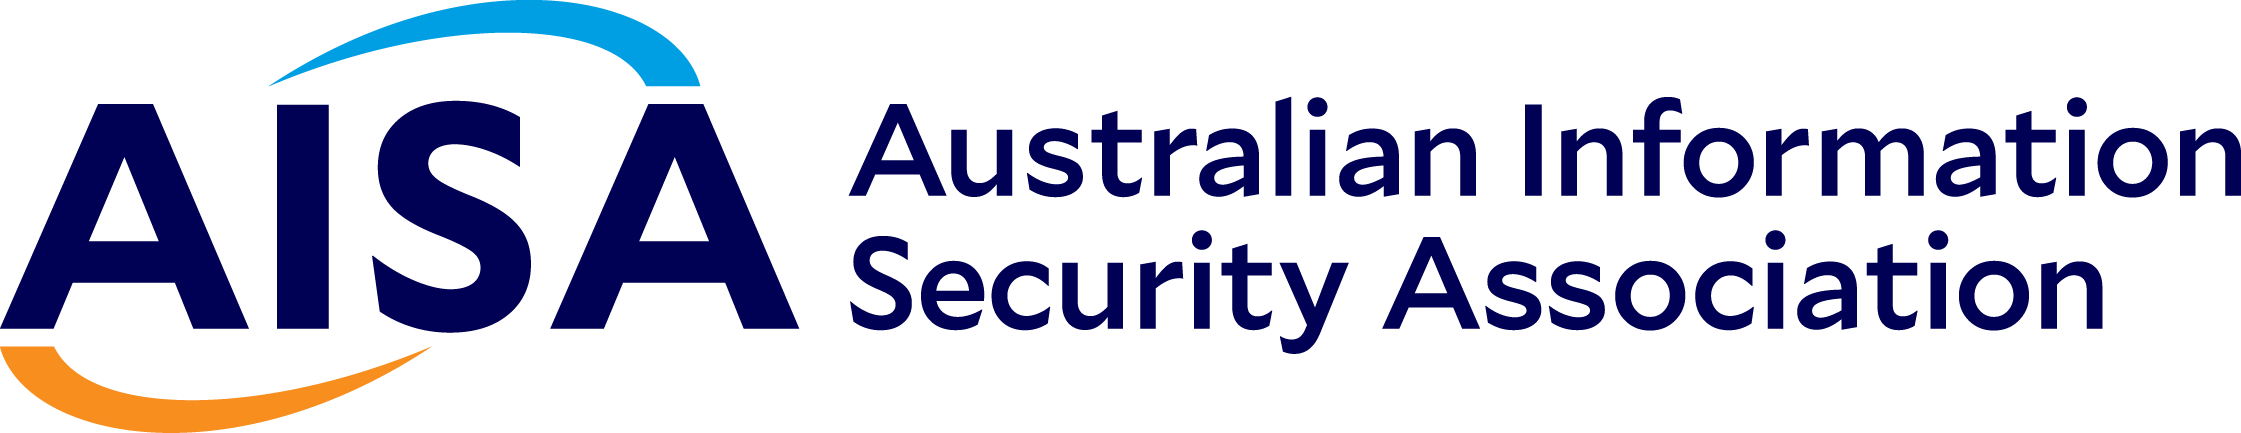 LogoAISA (Australian Information Security Association)